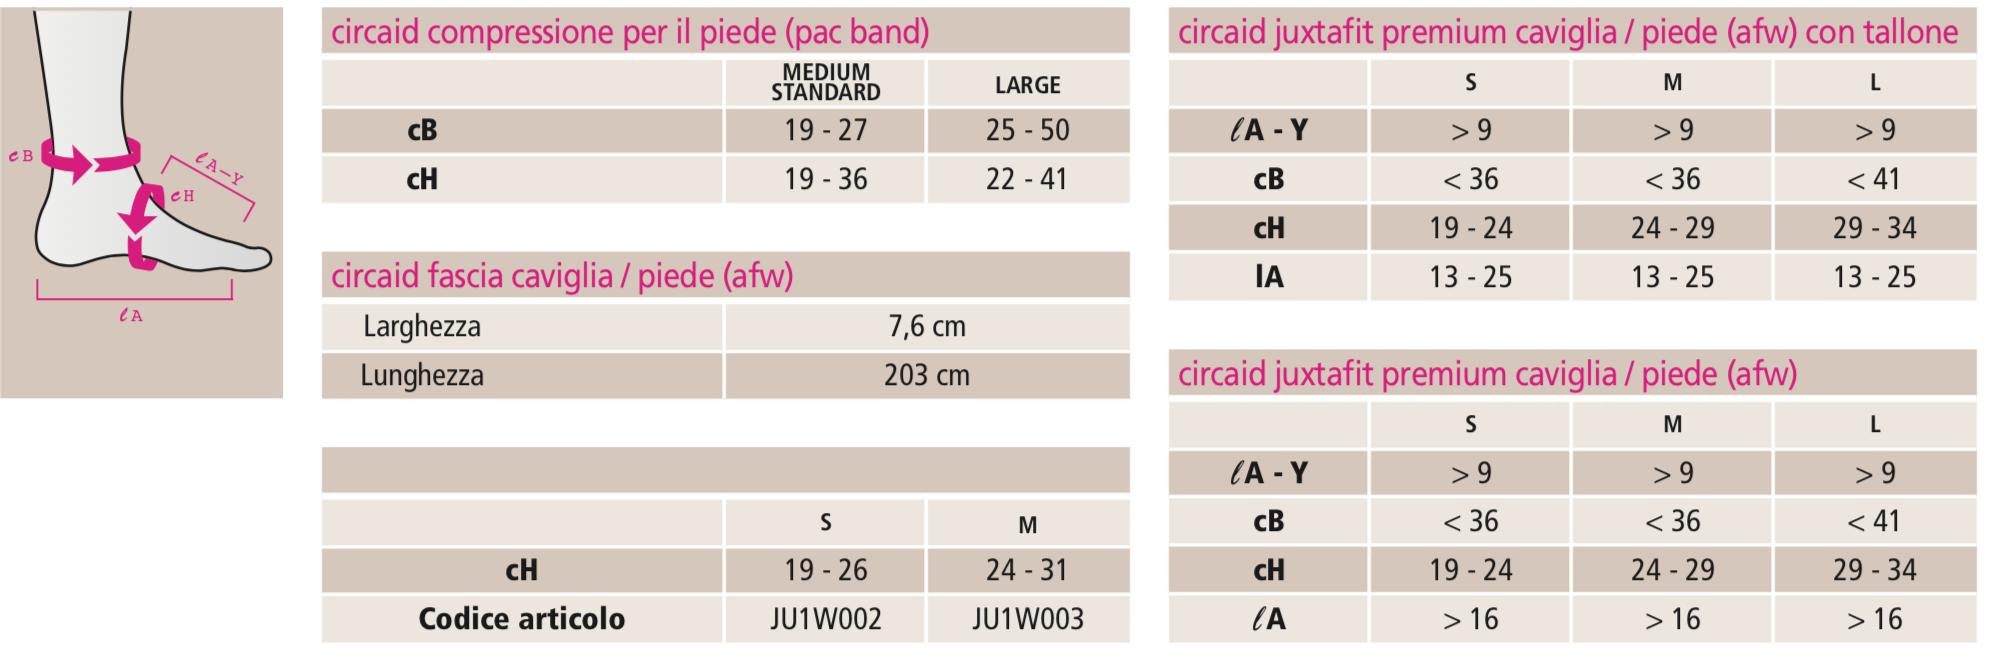 circaid®  juxtafit® premium caviglia / piede - Tutore compressivo terapeutico